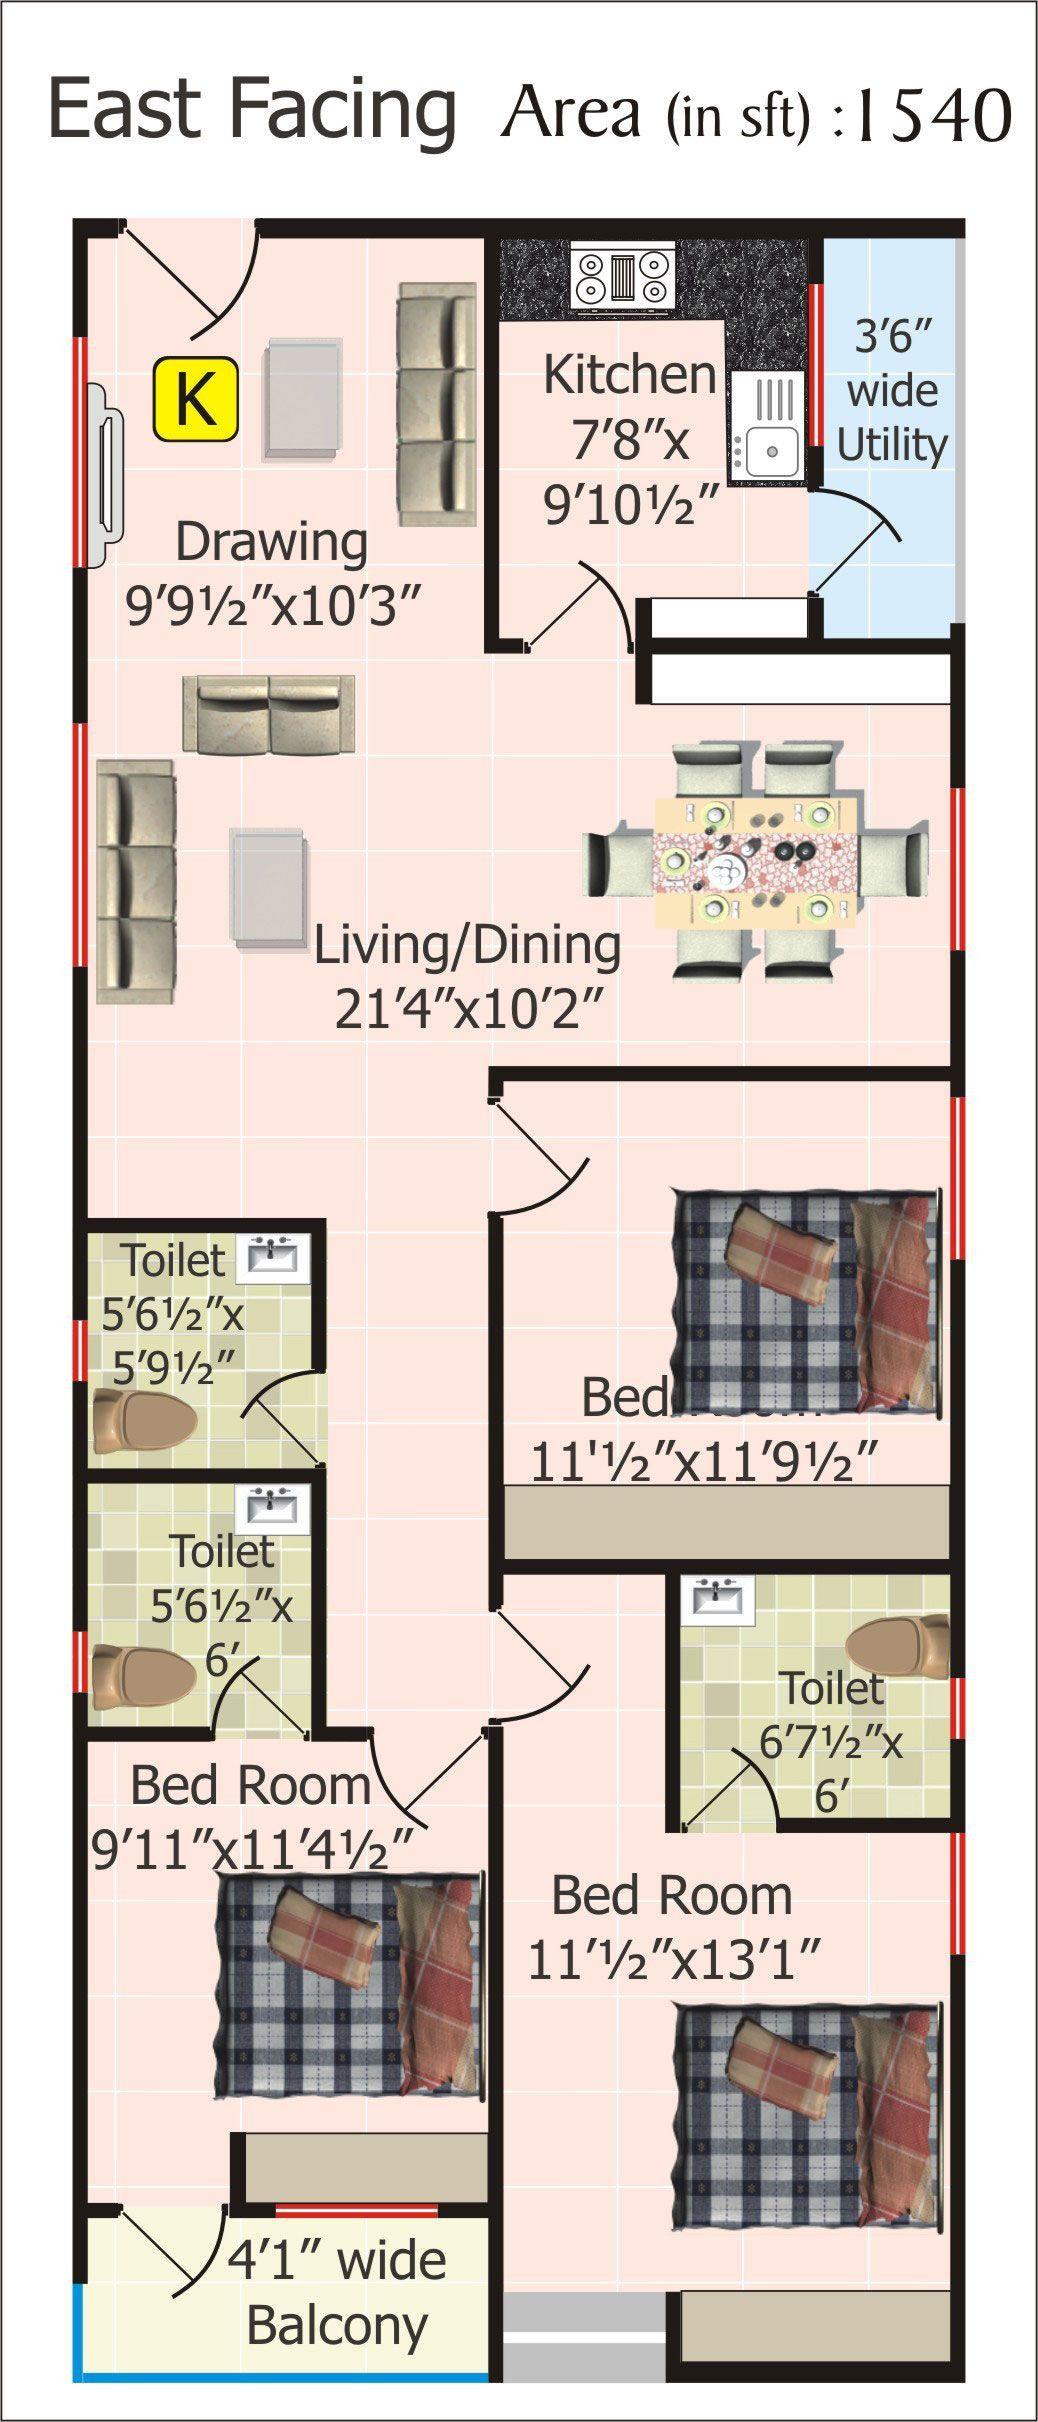 20 Wide House Plans 2020 Free House Plans 3d House Plans 2bhk House Plan